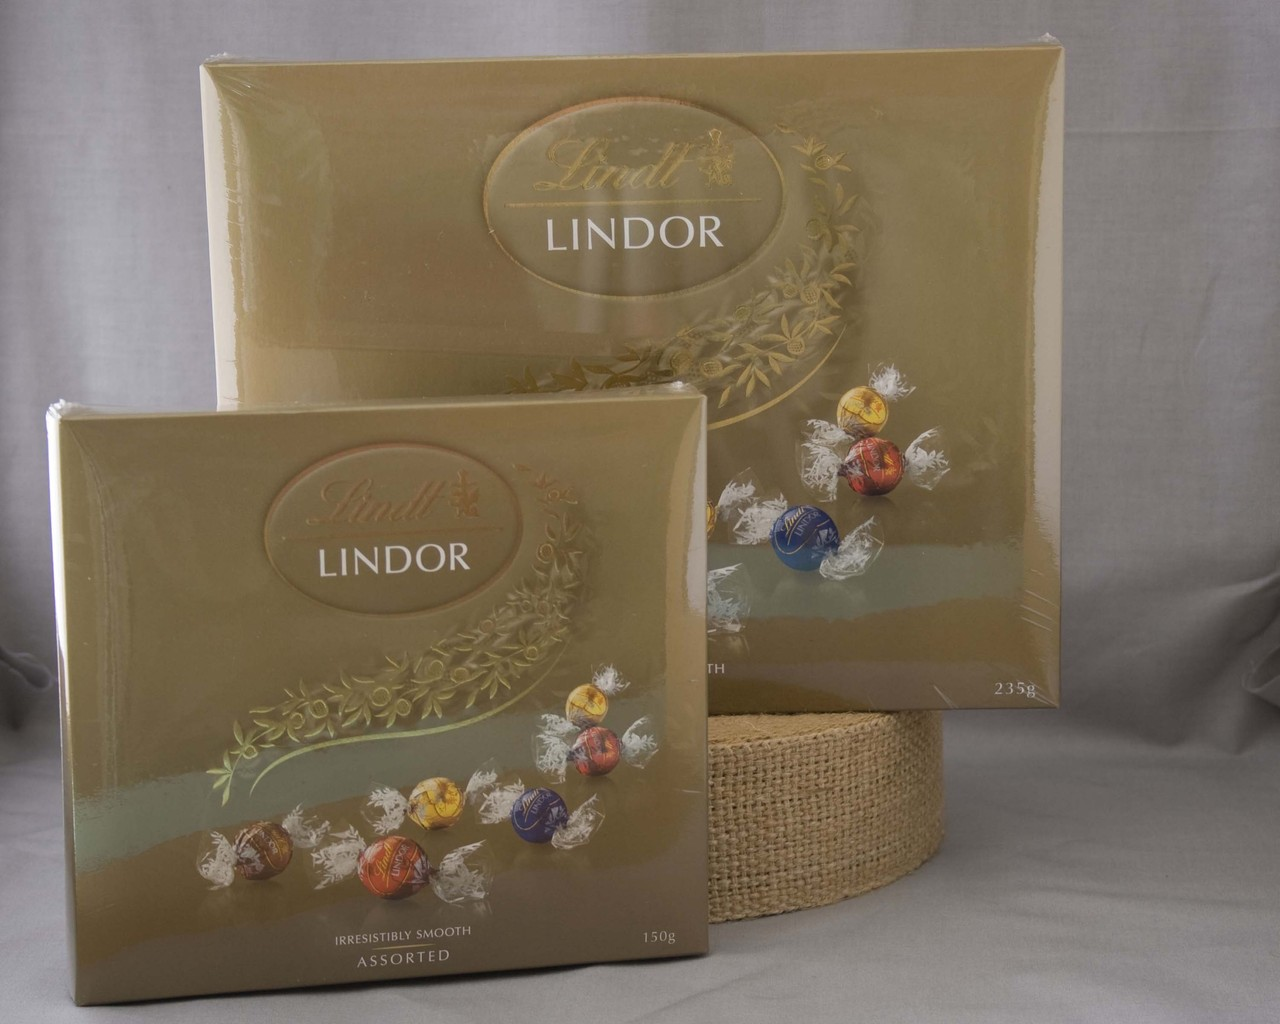 Lindt Lindor - Assorted Chocolates 150g